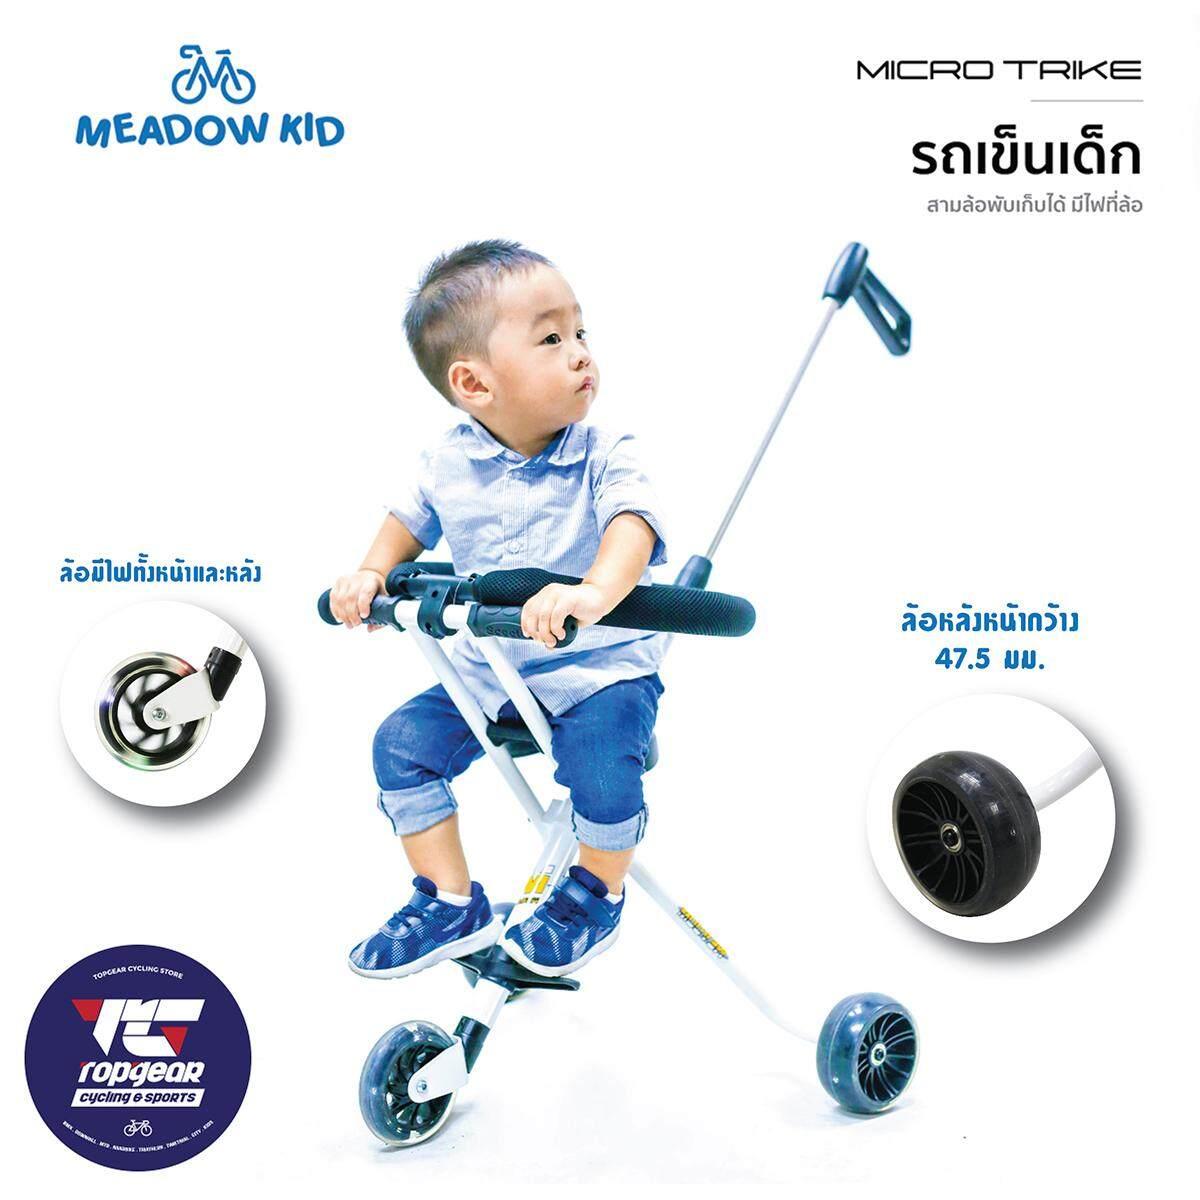 MEADOW รถเข็นเด็ก 3 ล้อ (Micro Trike)